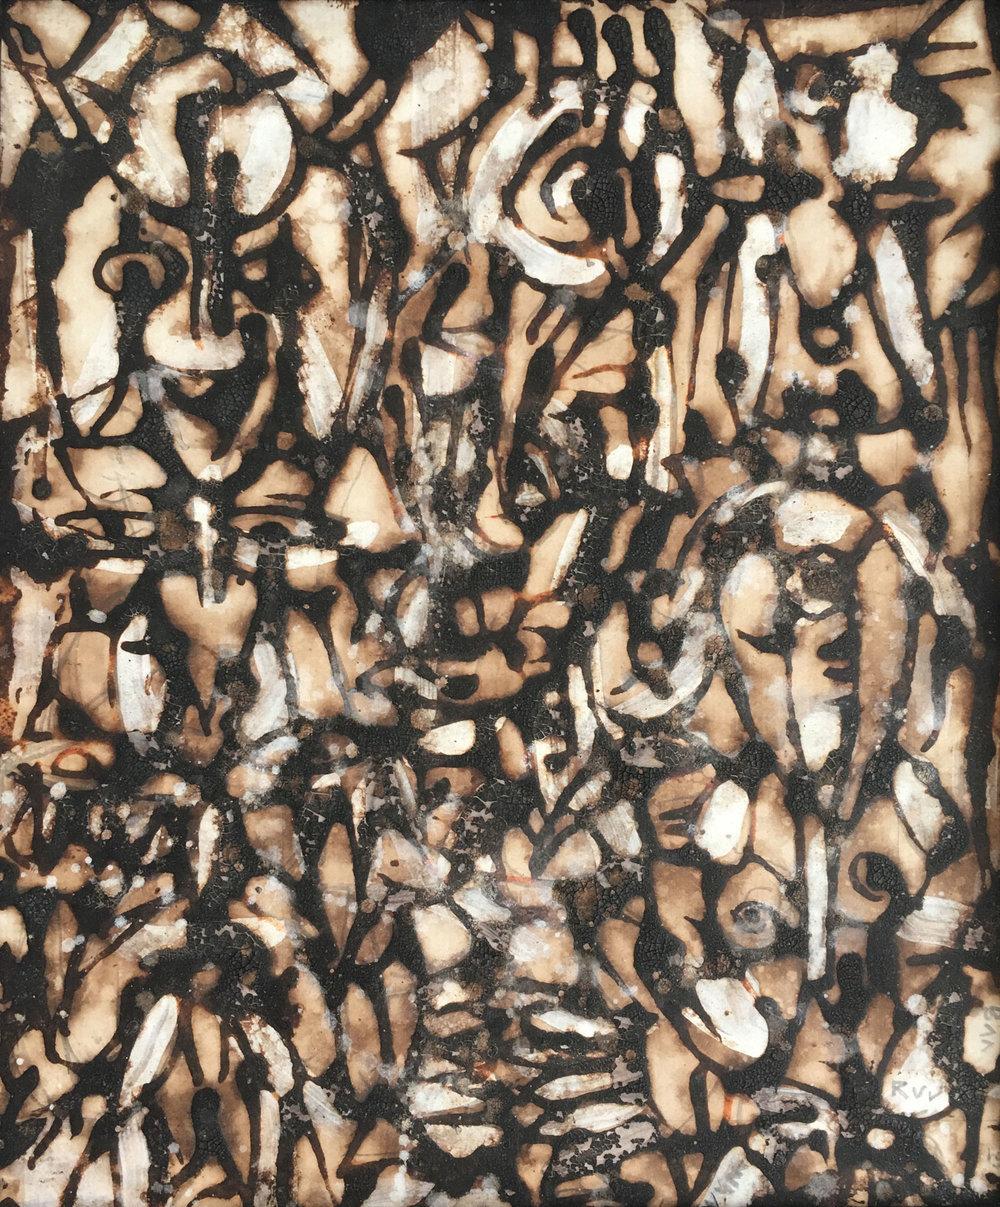 """Attendant"", natural pigment on paper, 25 x 20 cm, 2013. ©Akinjide Baruwa"